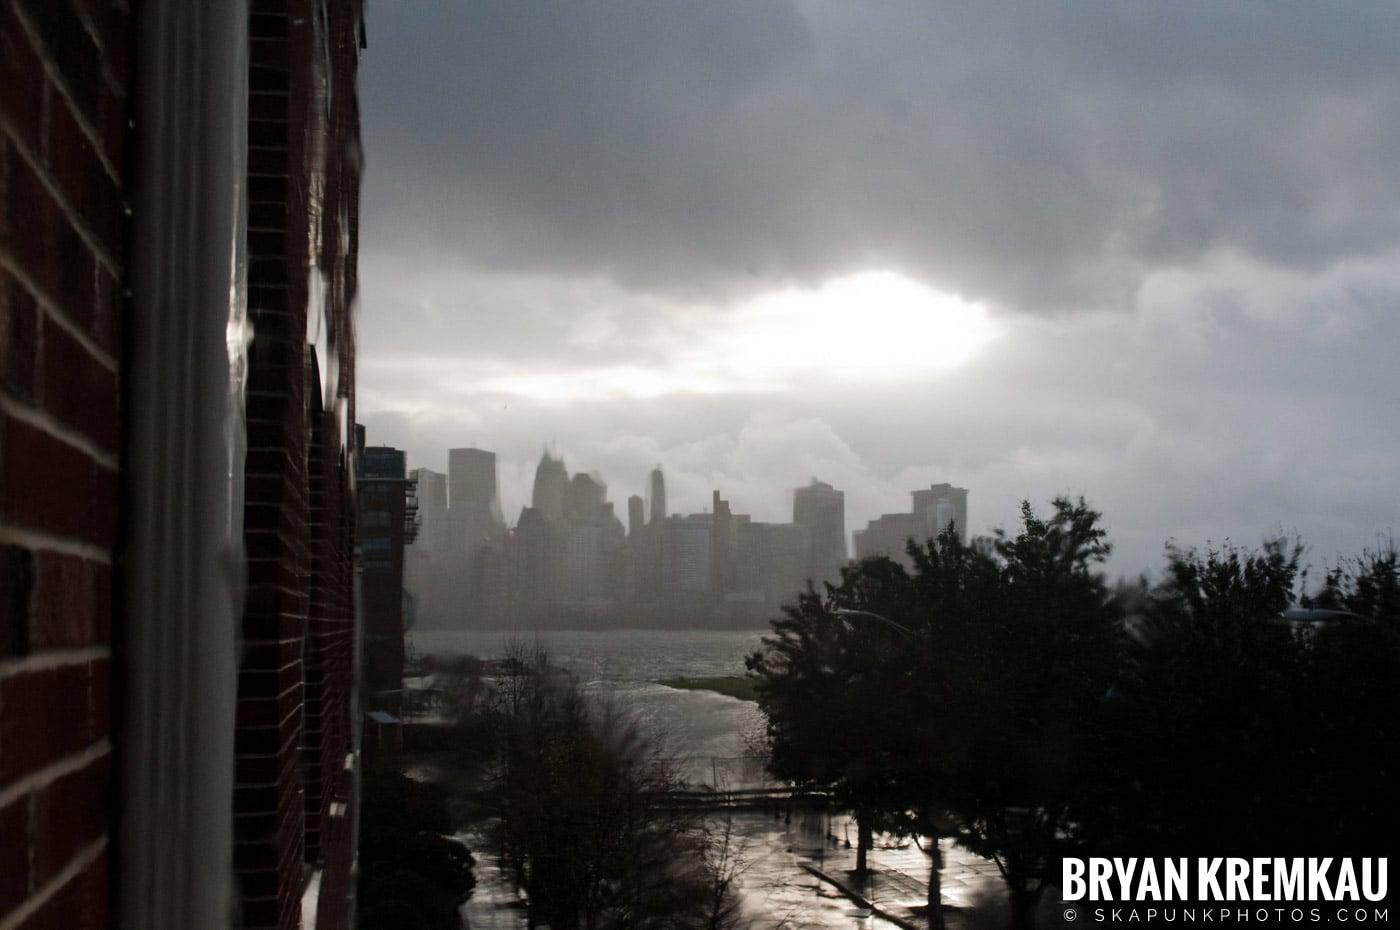 Hurricane Sandy 2012 @ Paulus Hook, Jersey City - 10.29.12 - 10.30.12 (45)